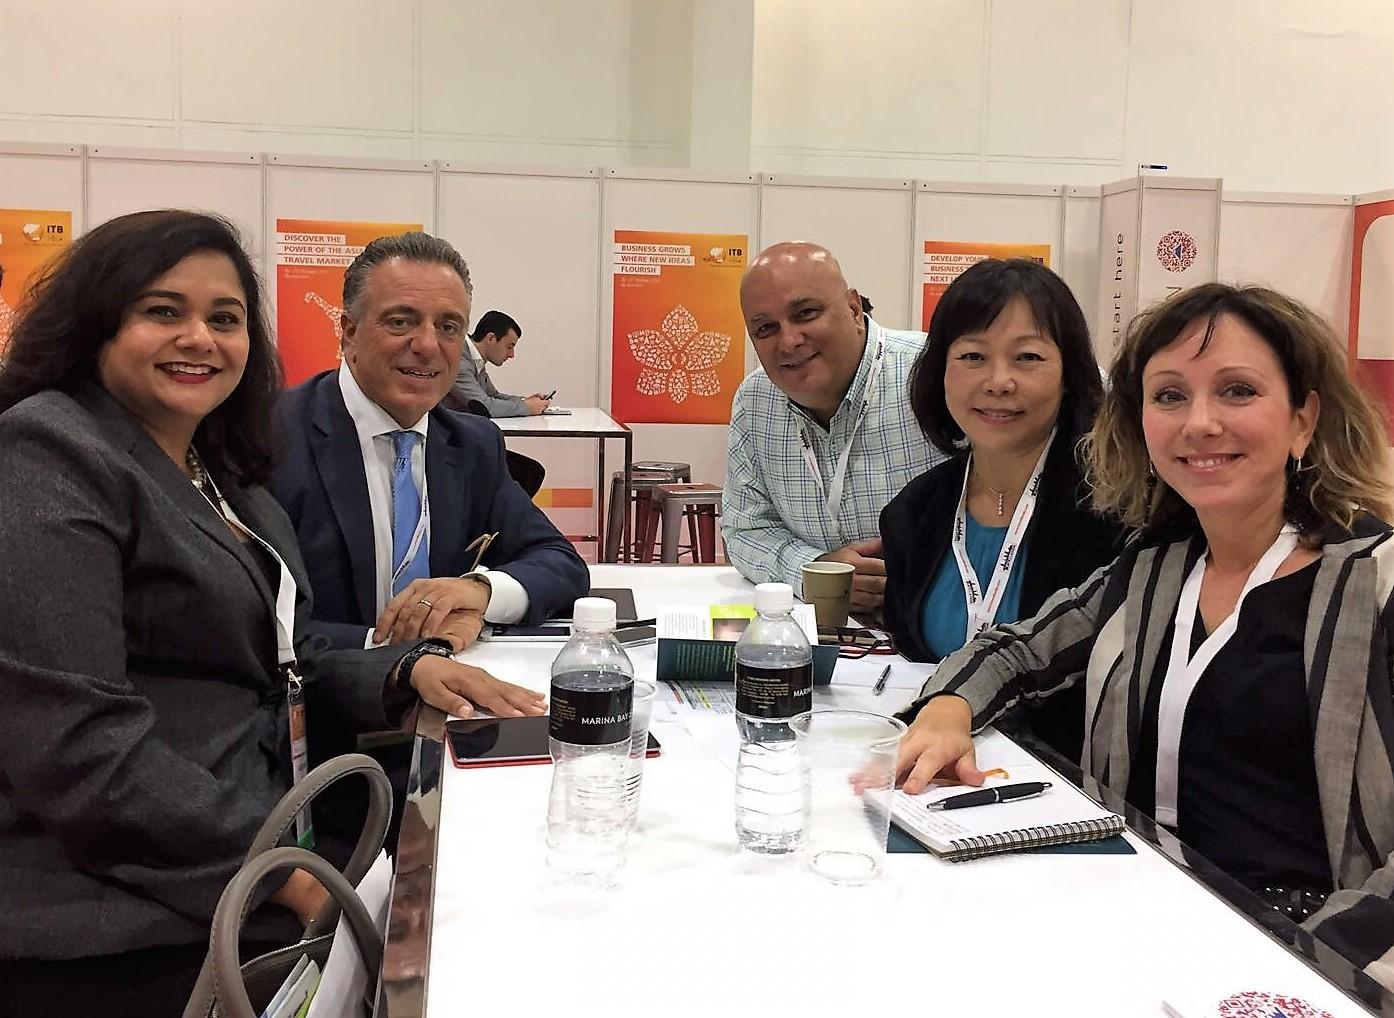 From left to right:  Ms Jagdish Sandhu (CEO, FLA), Mr Massimo Macchi (MD, Klima Hotel Milano), Mr Fabrizio Tiribello (GM, 8PM Events), Ms Serene Law (VP, FLA), Ms Roberta Semino (Director Commercial, Klima Hotel Milano).